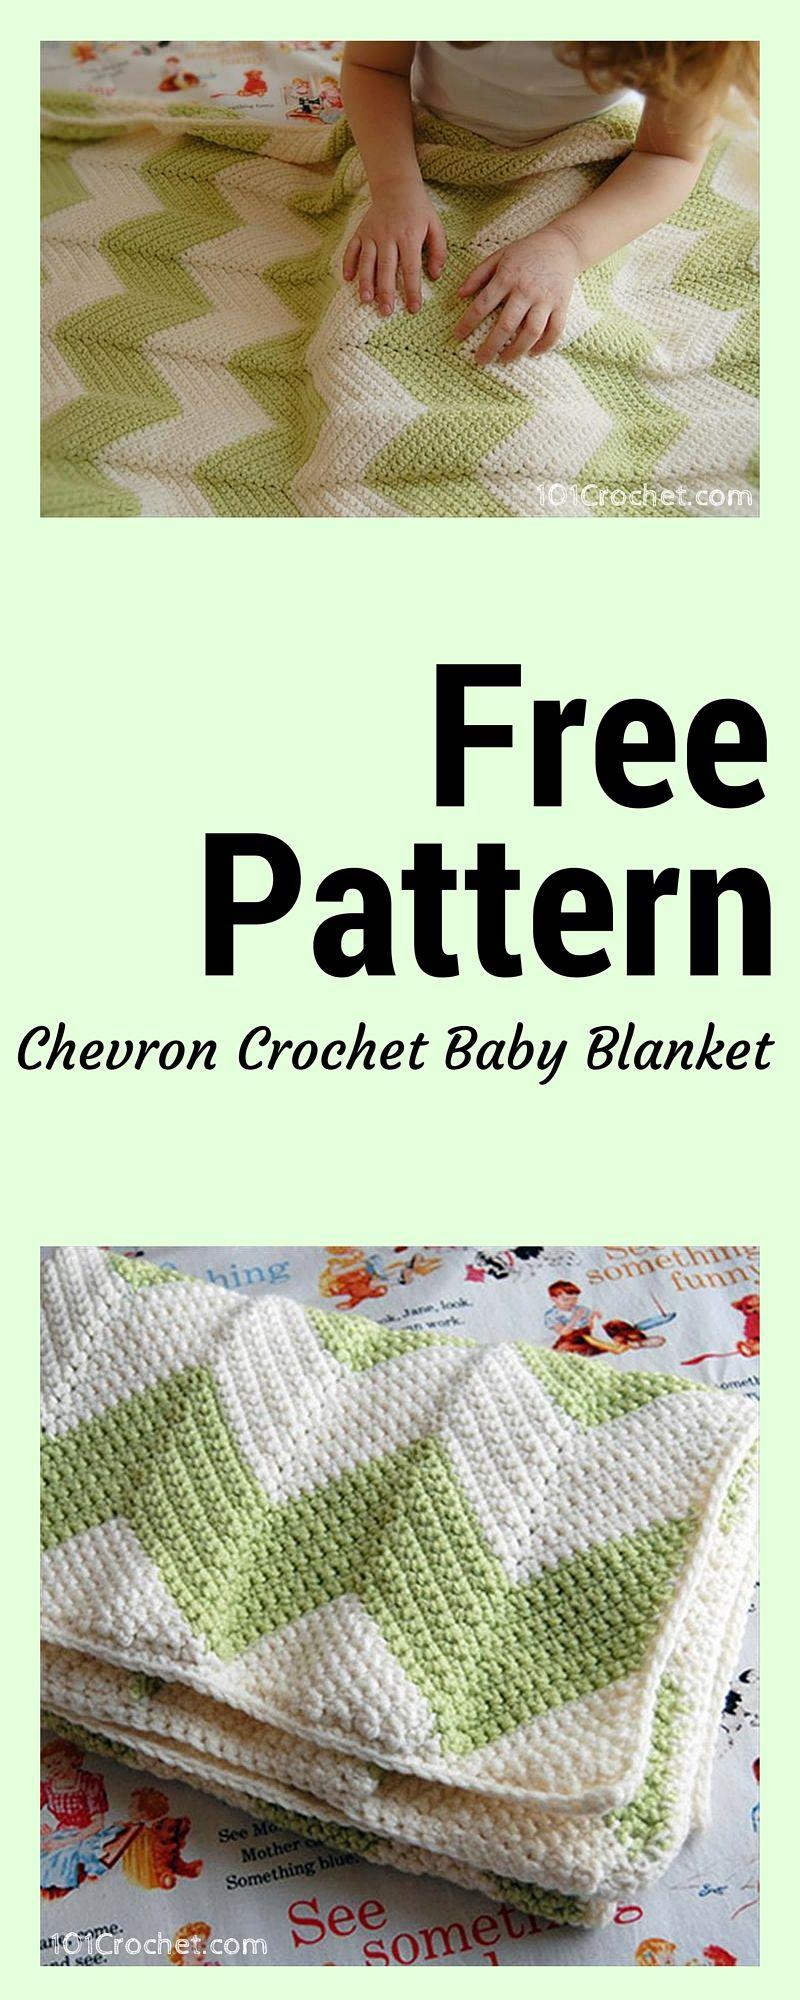 Free Chevron Crochet Baby Blanket Pattern | Manta, Cobija y Cobijas ...